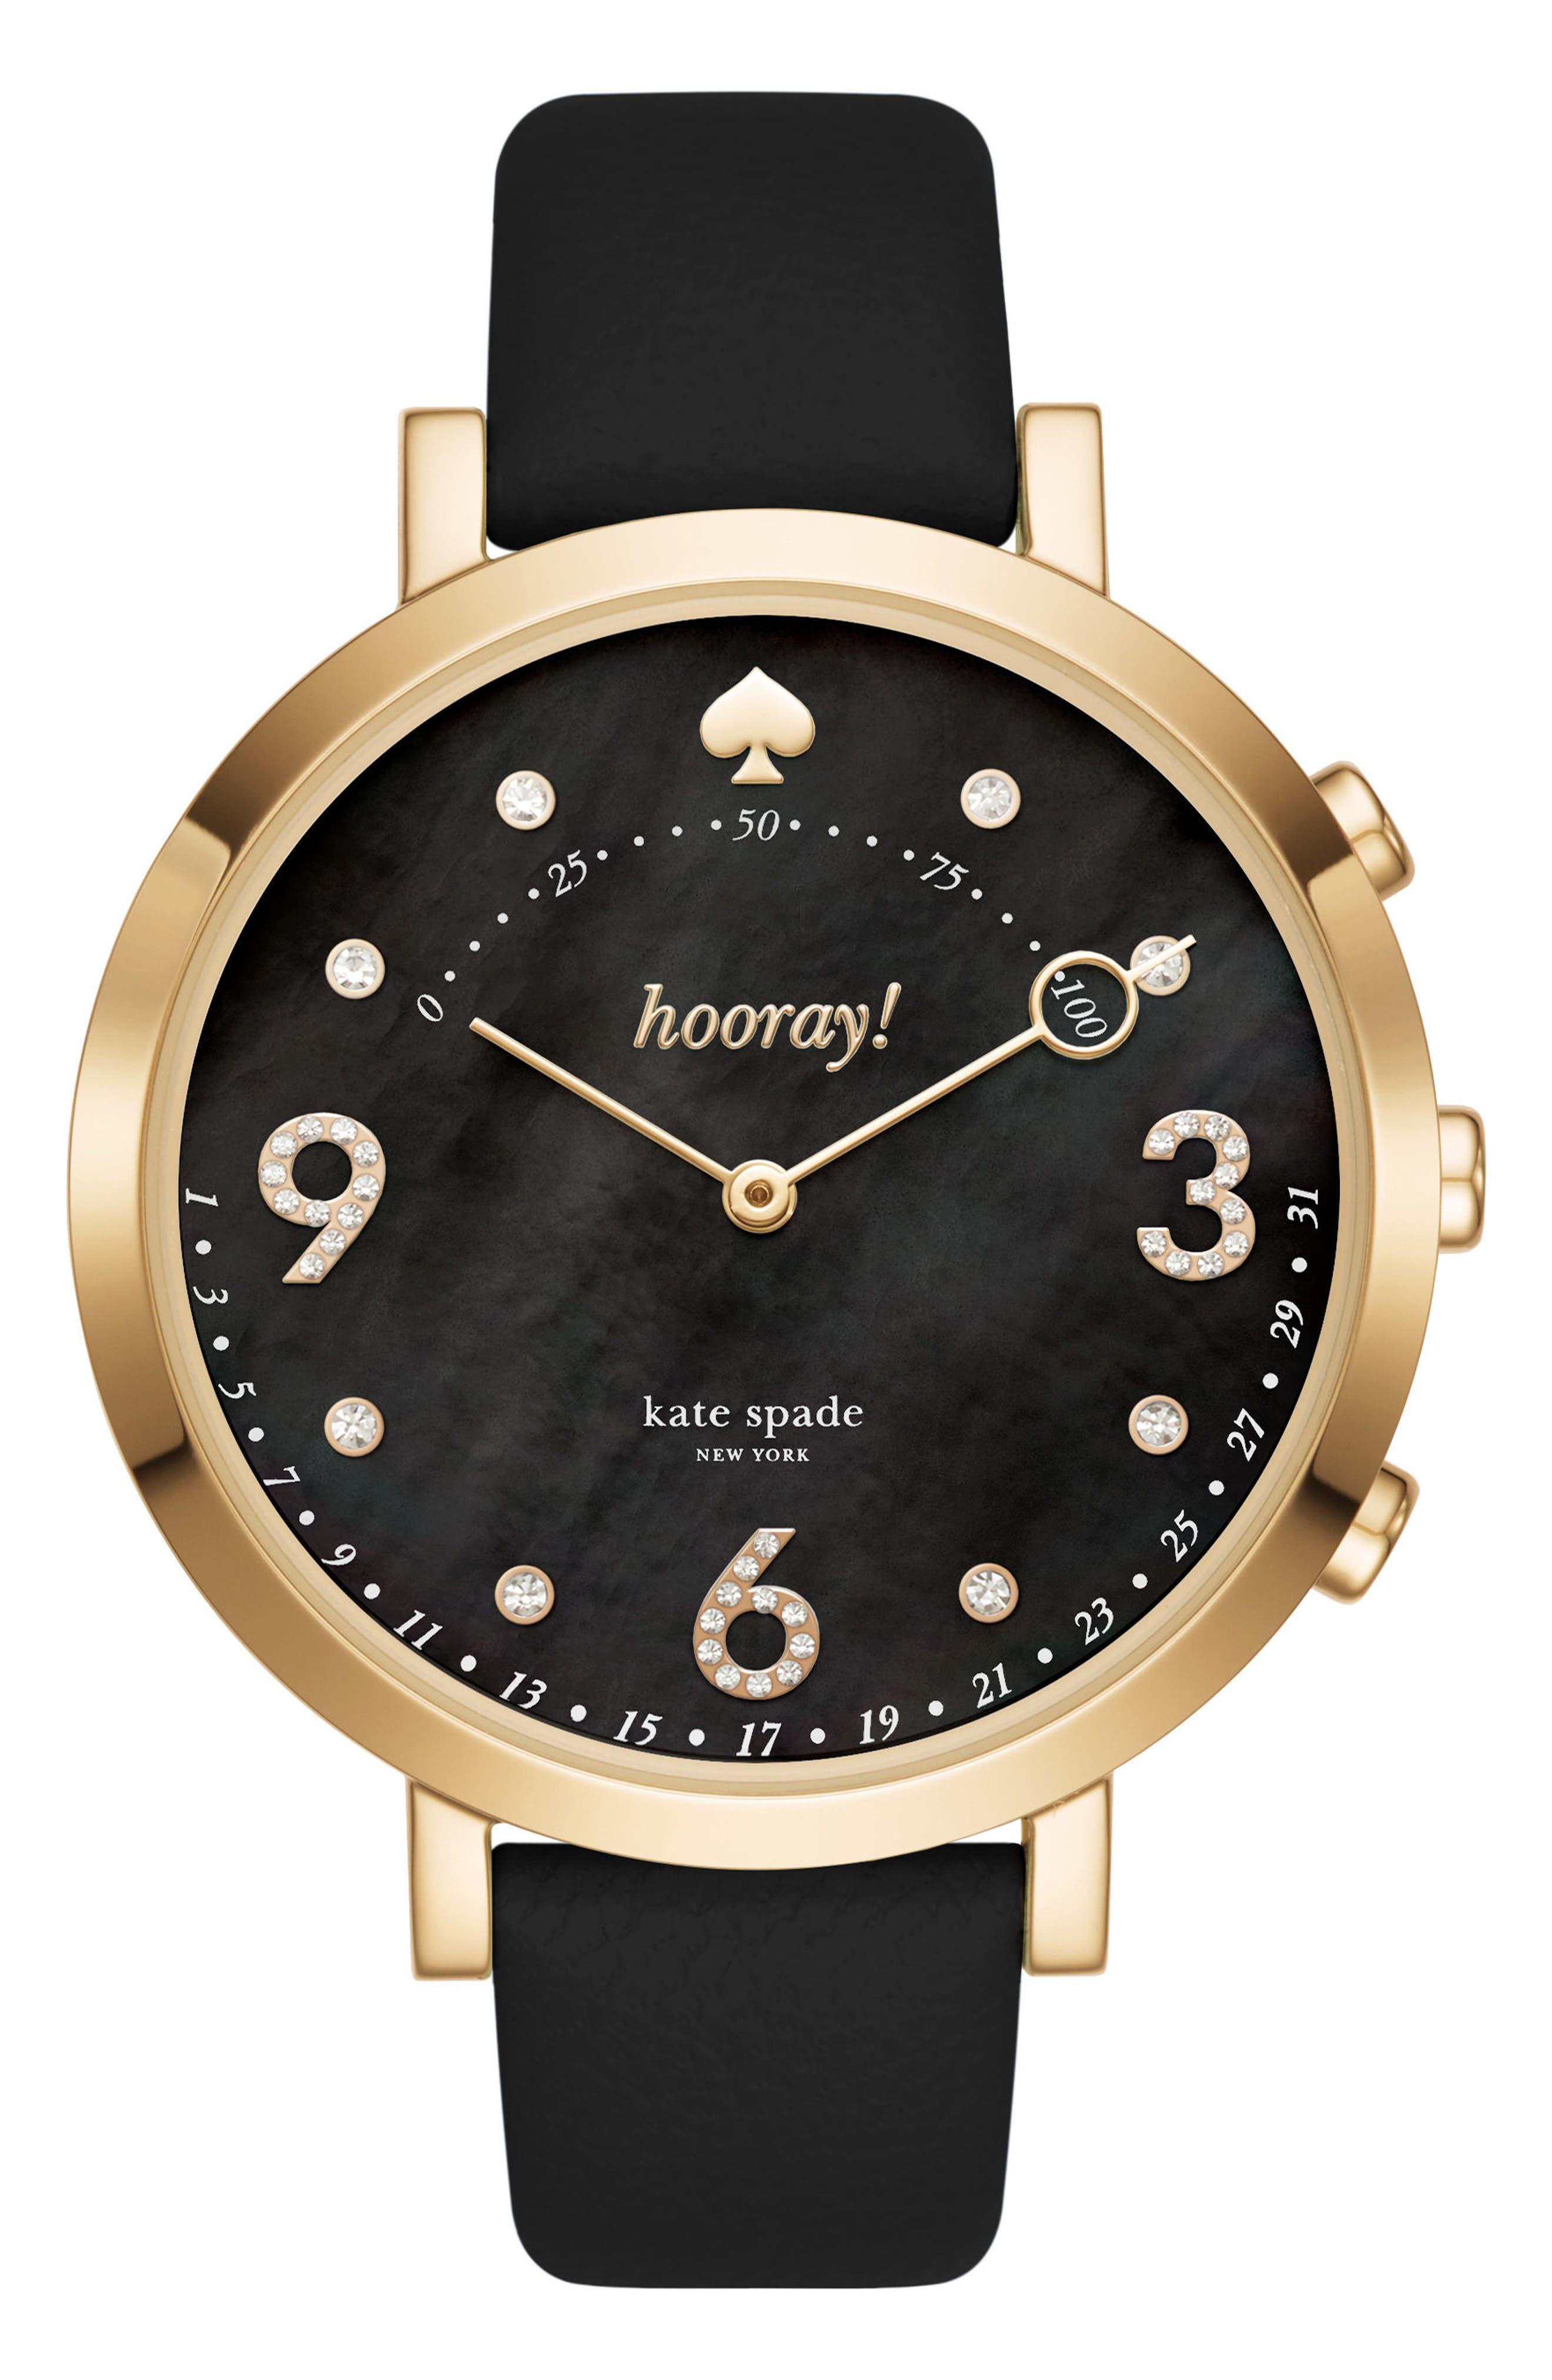 kate spade new york monterey hybrid leather strap watch, 41mm